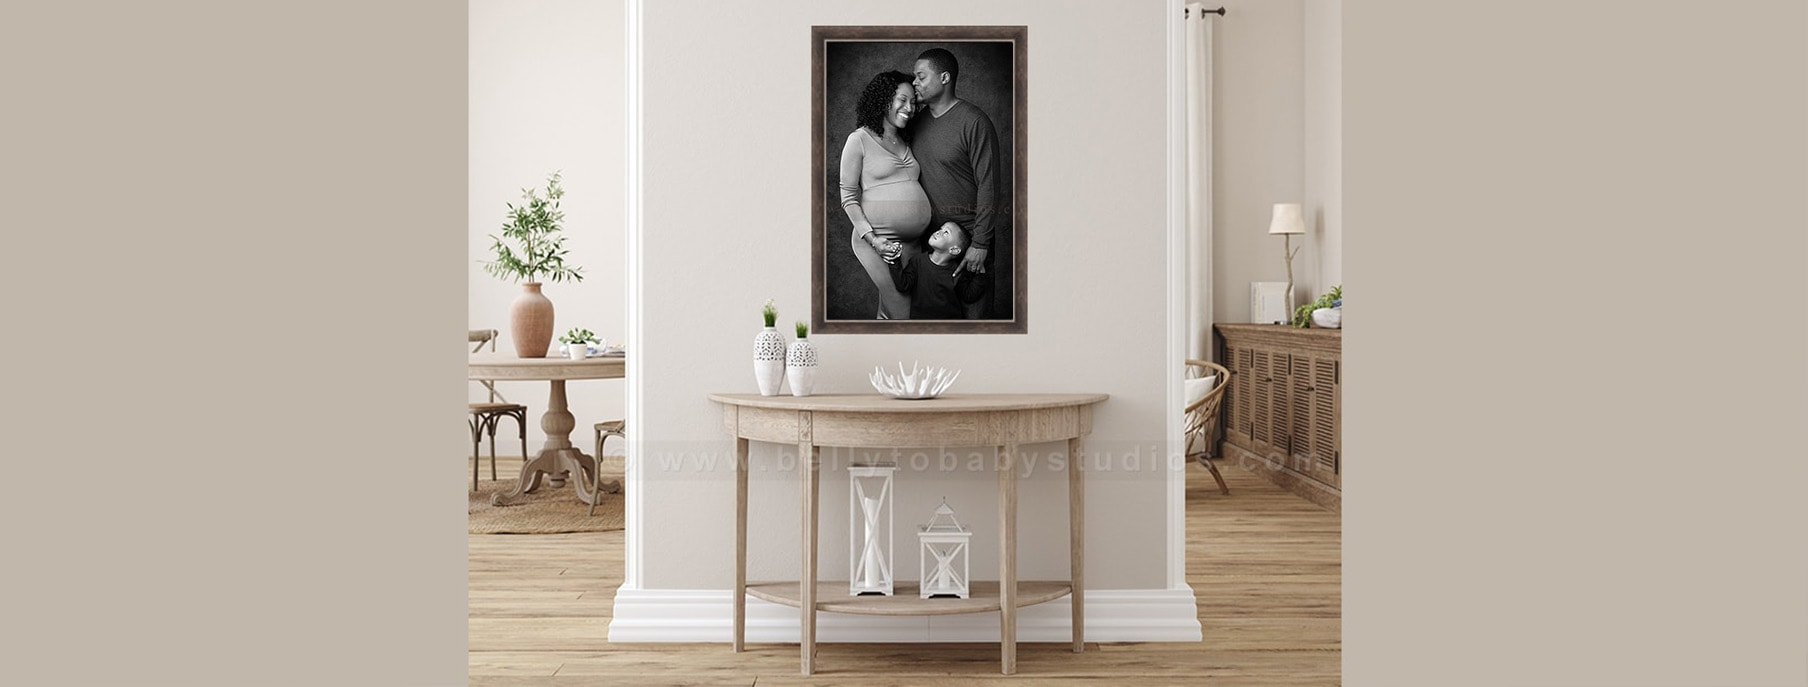 Maternity-Family-Photography-in-Houston